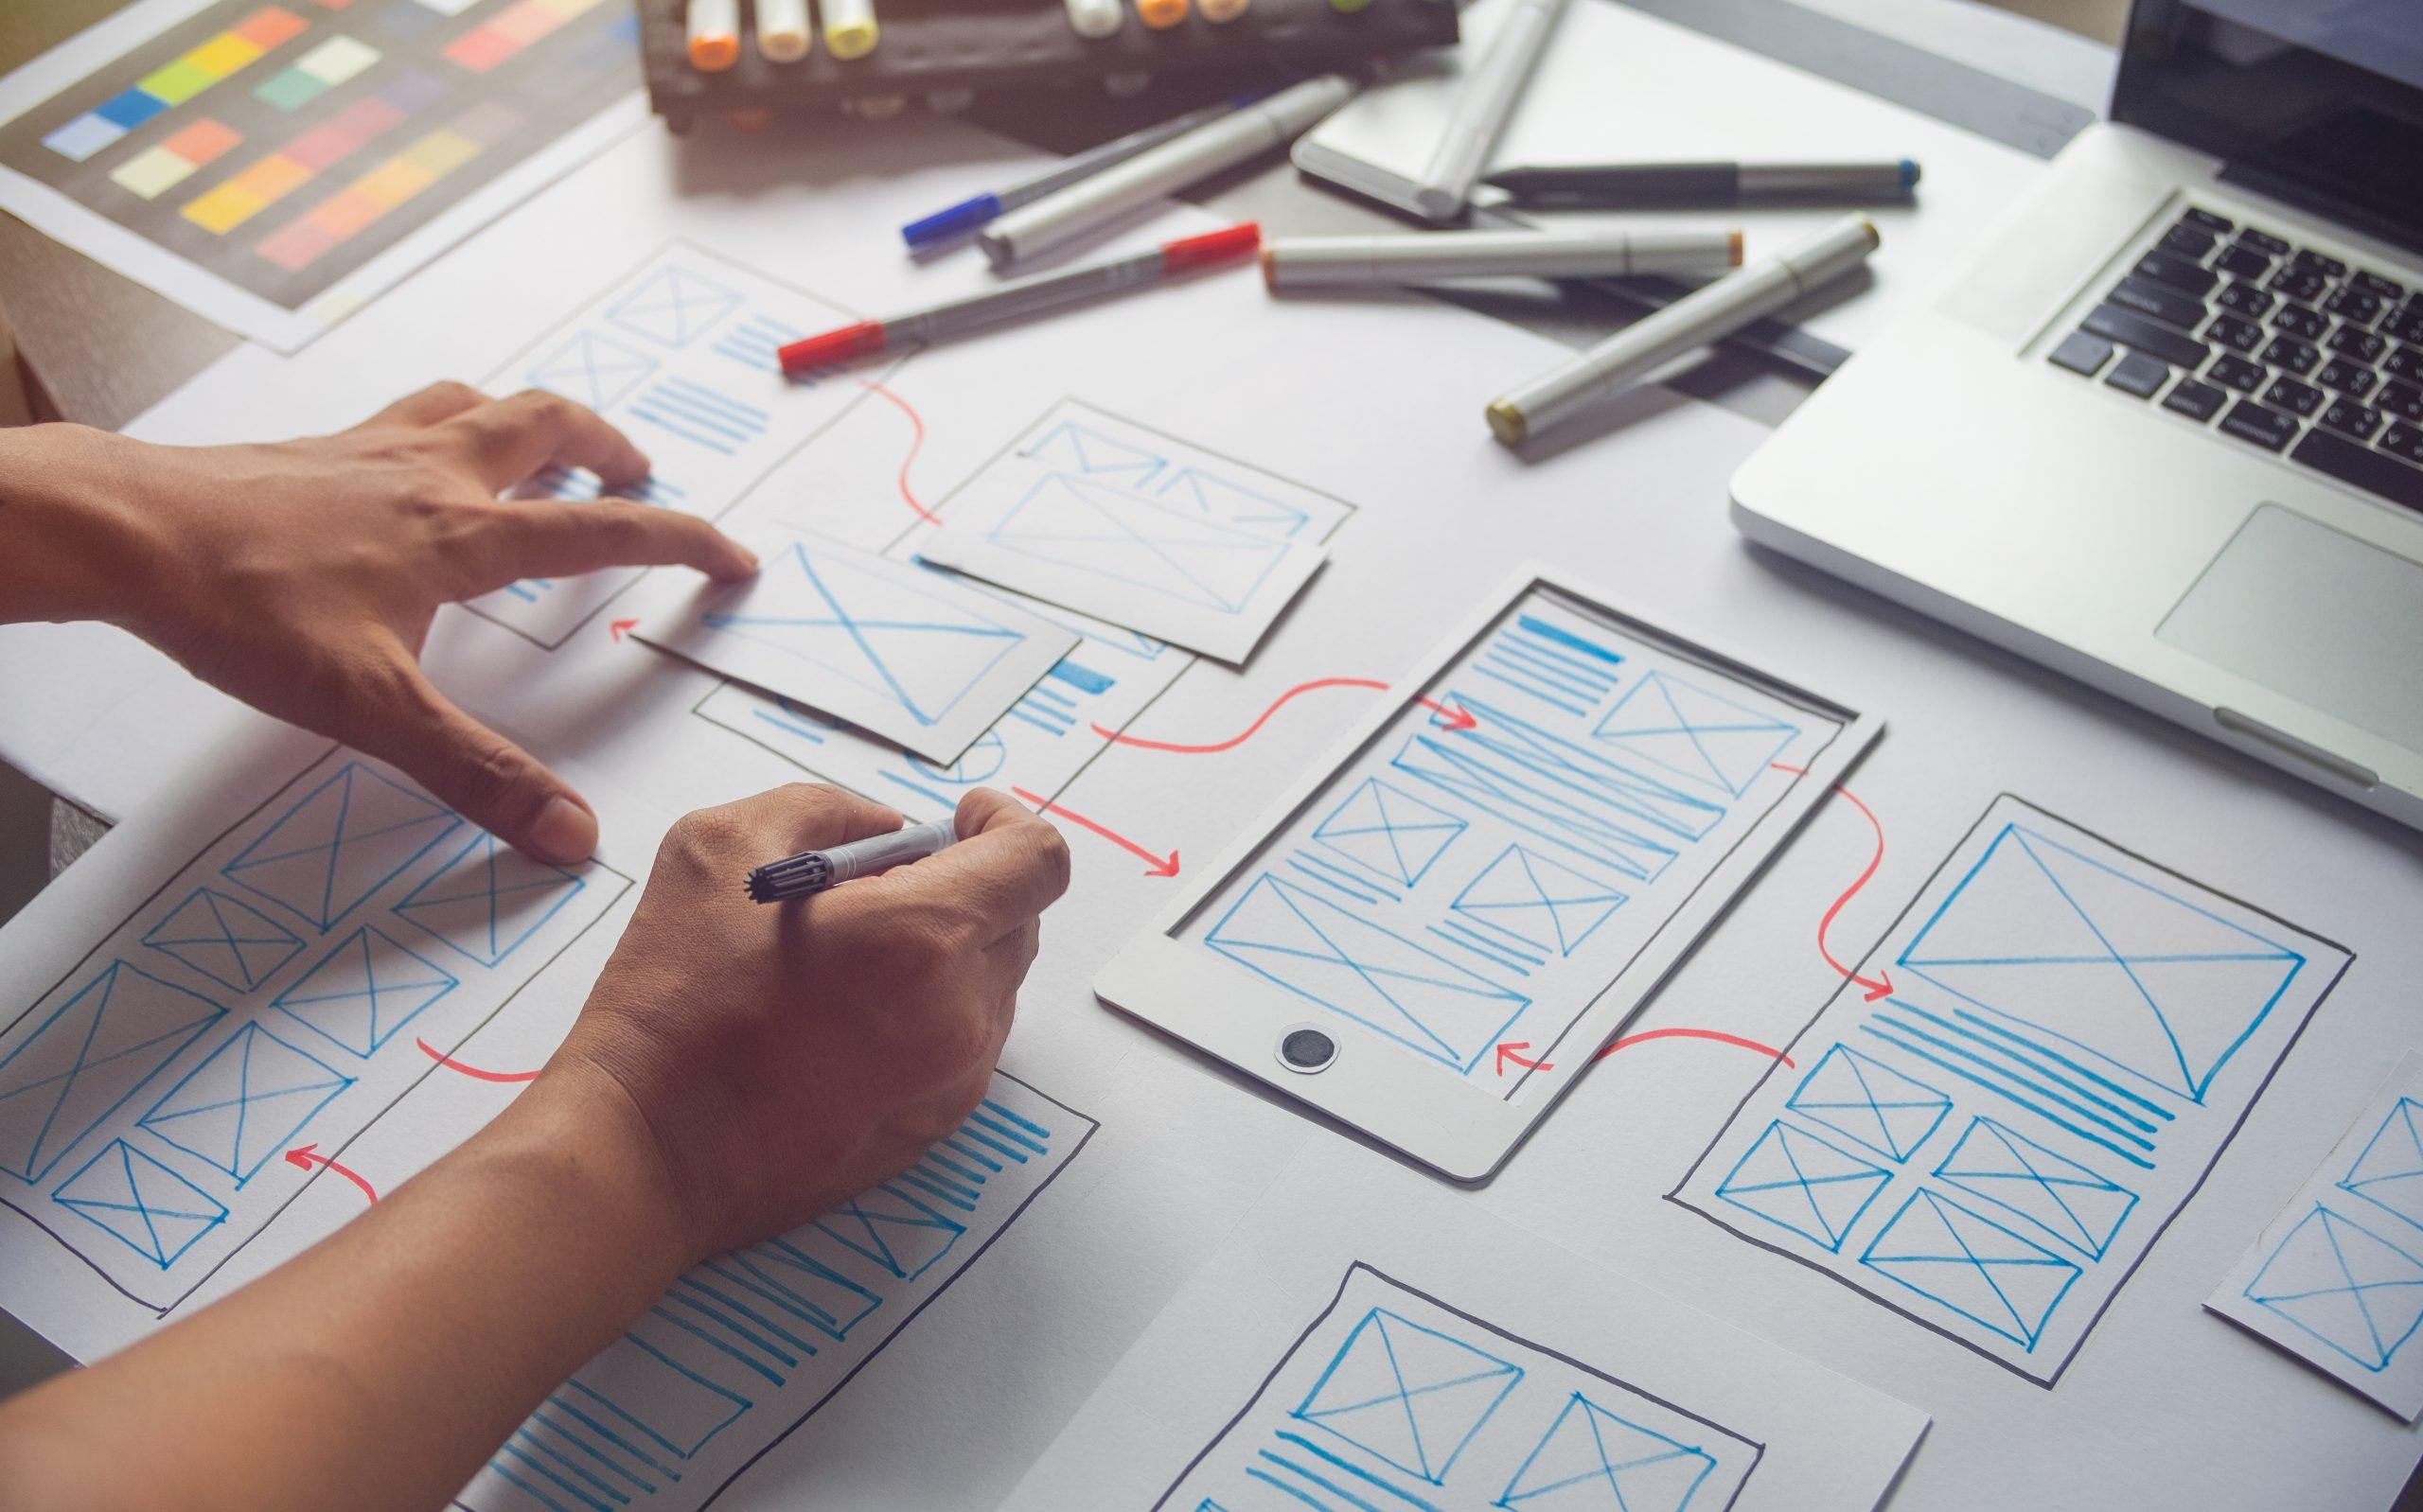 Ux,Graphic,Designer,Creative,Sketch,Planning,Application,Process,Development,Prototype